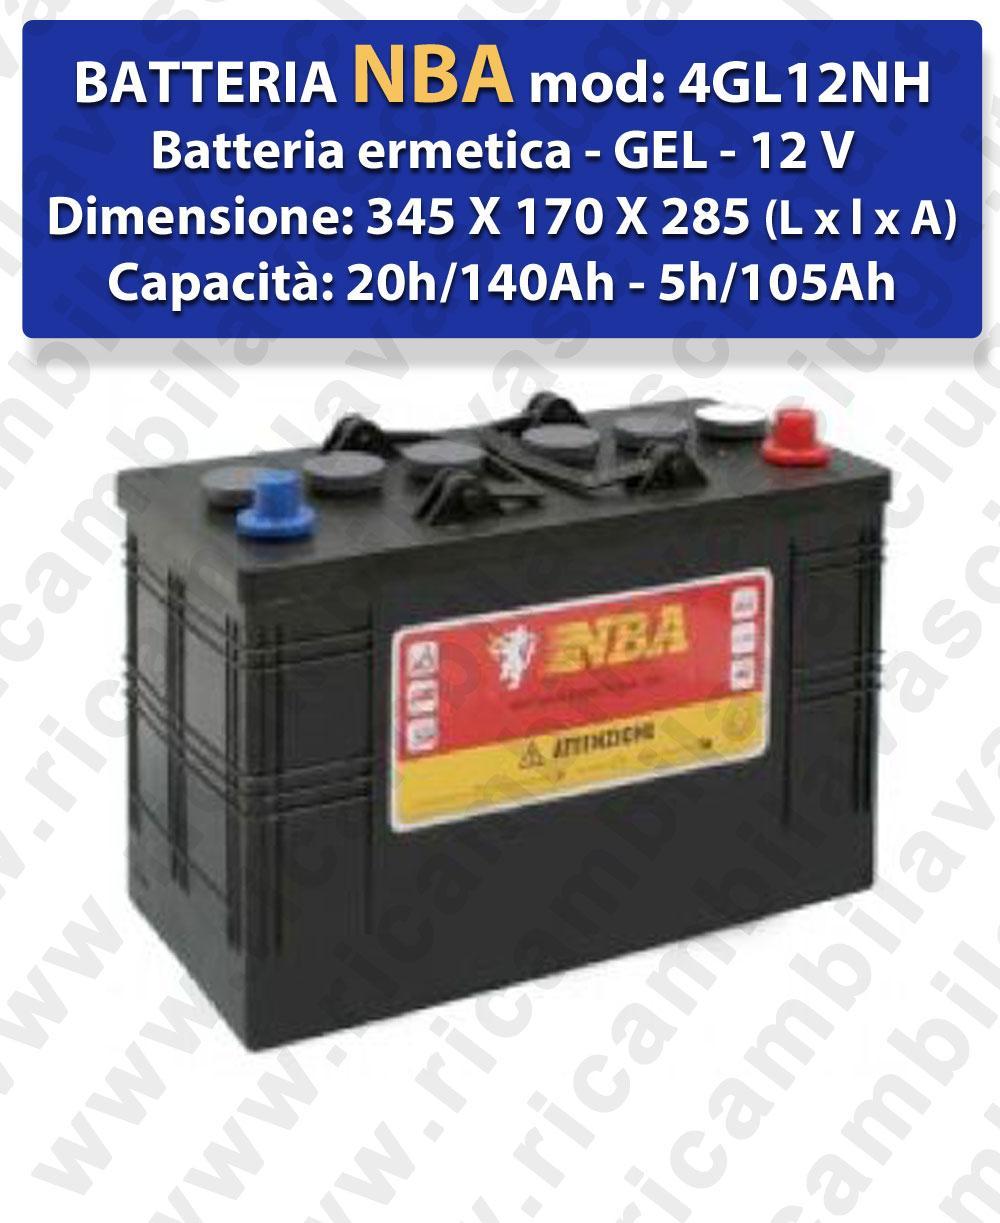 4GL12NH Batteria Ermetica GEL  - NBA 12V 140Ah 20/h